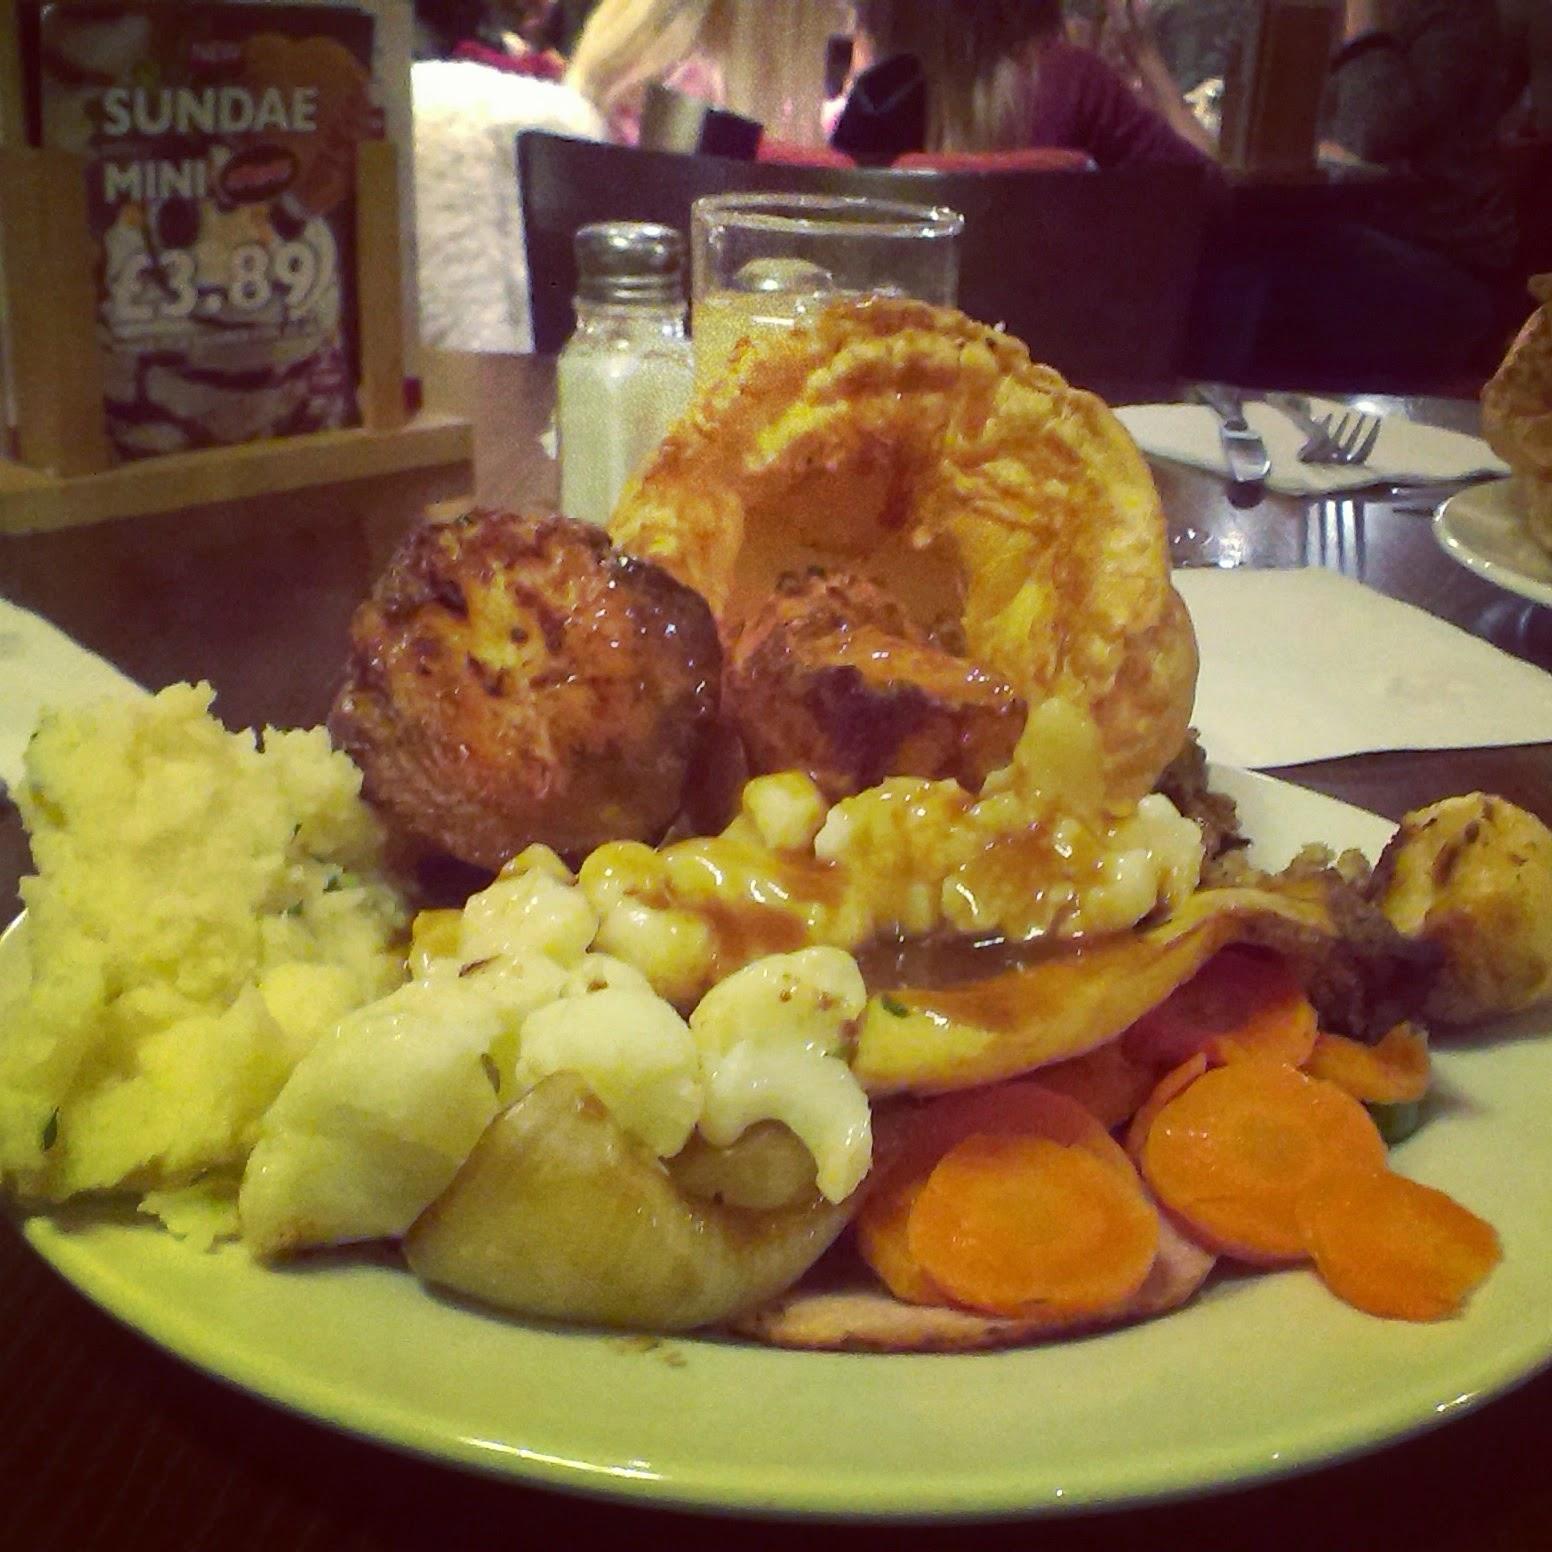 Toby Carvery Roast Dinner